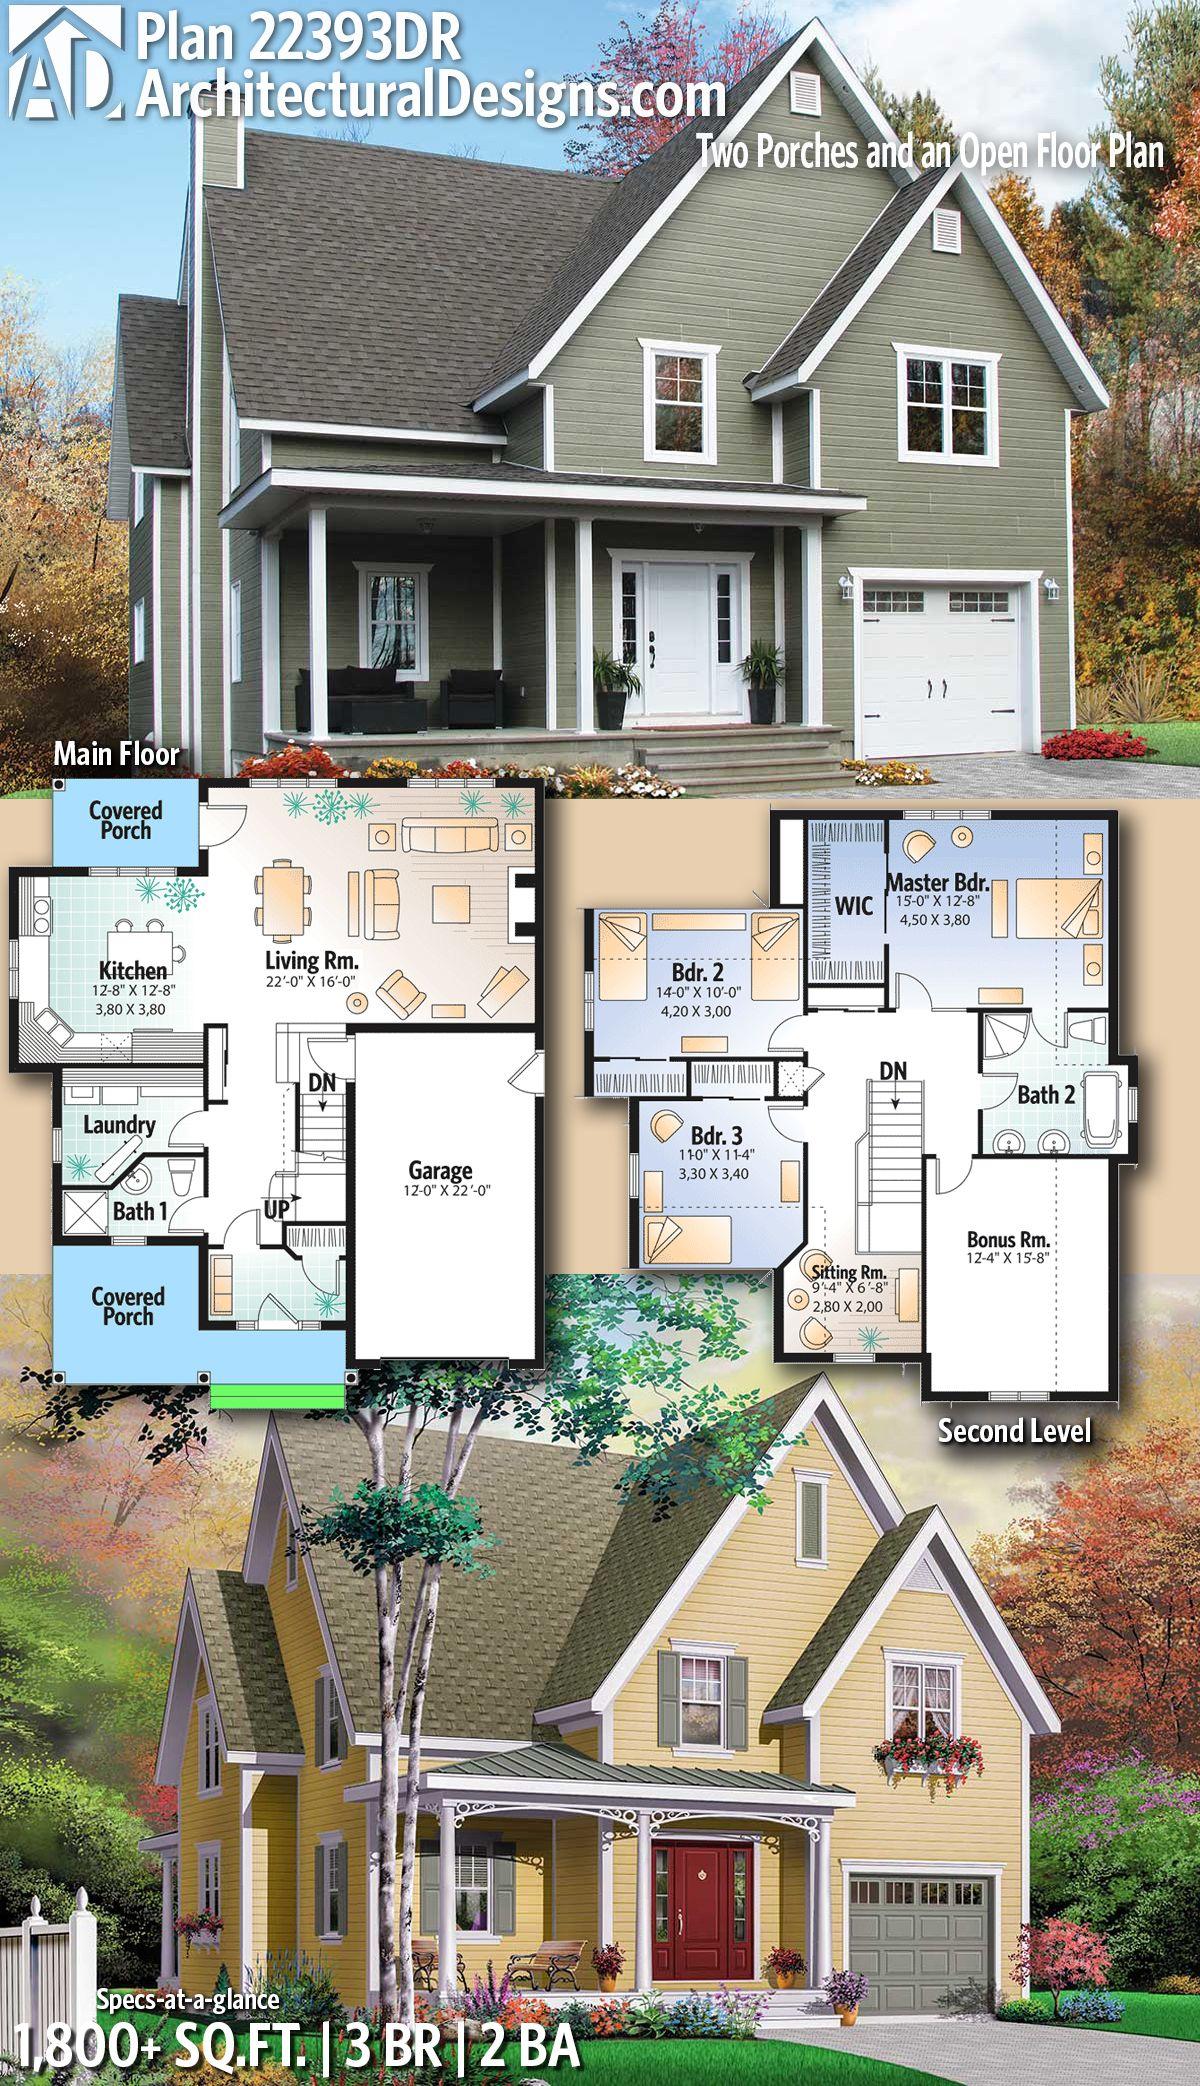 Plan 22393dr Two Porches And An Open Floor Plan House Blueprints Architectural Design House Plans Dream House Plans